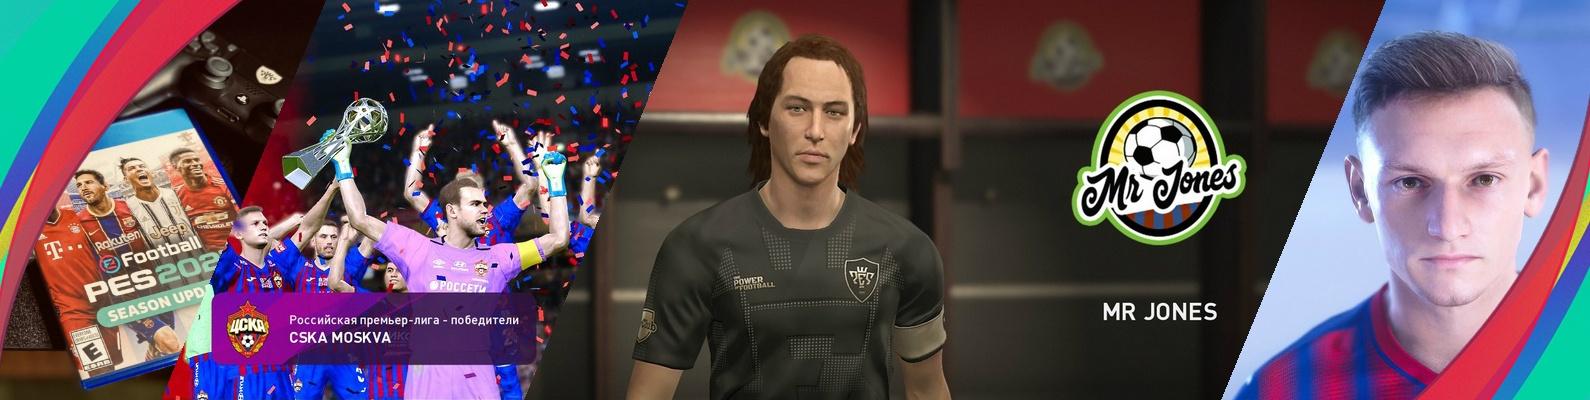 Mr Jones 2021